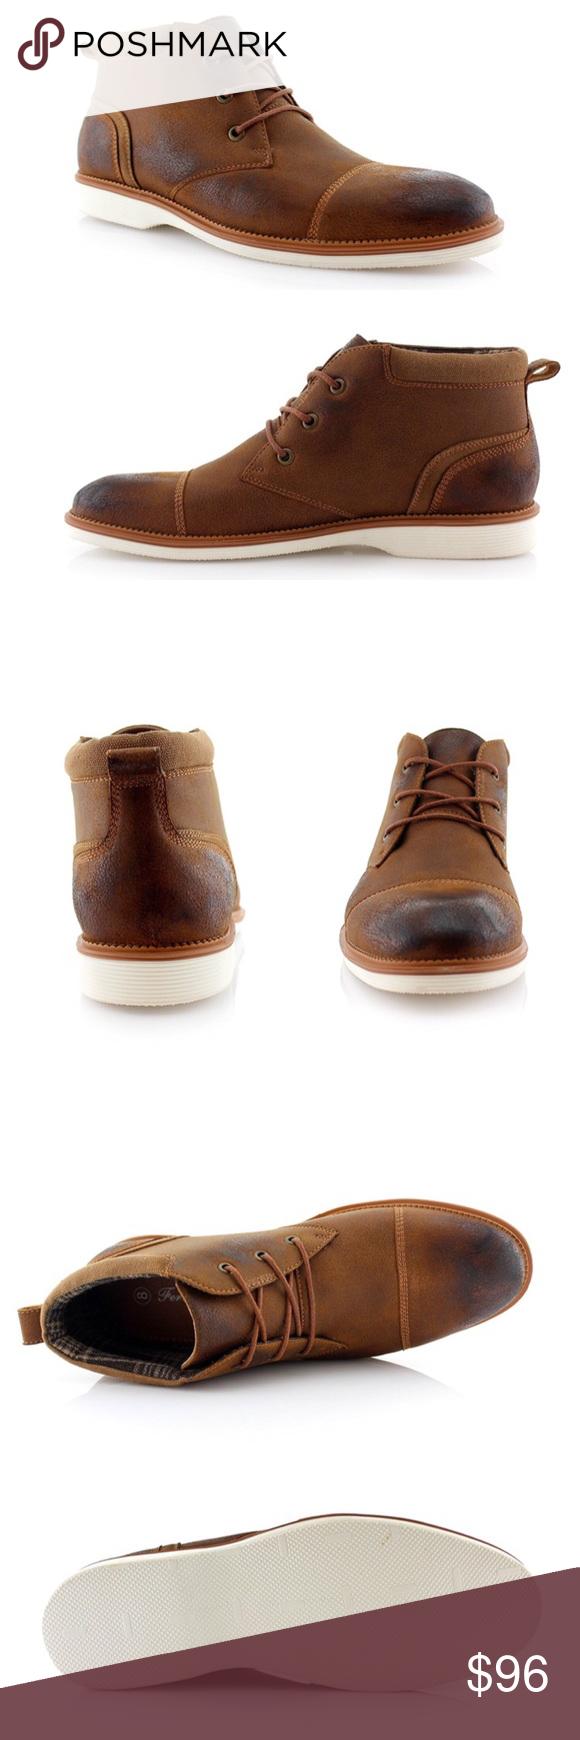 8491bfe2687 NEW Mens Chukka Boots Ferro 'Houston' Aldo NEW Men's Lace-up Ankle ...